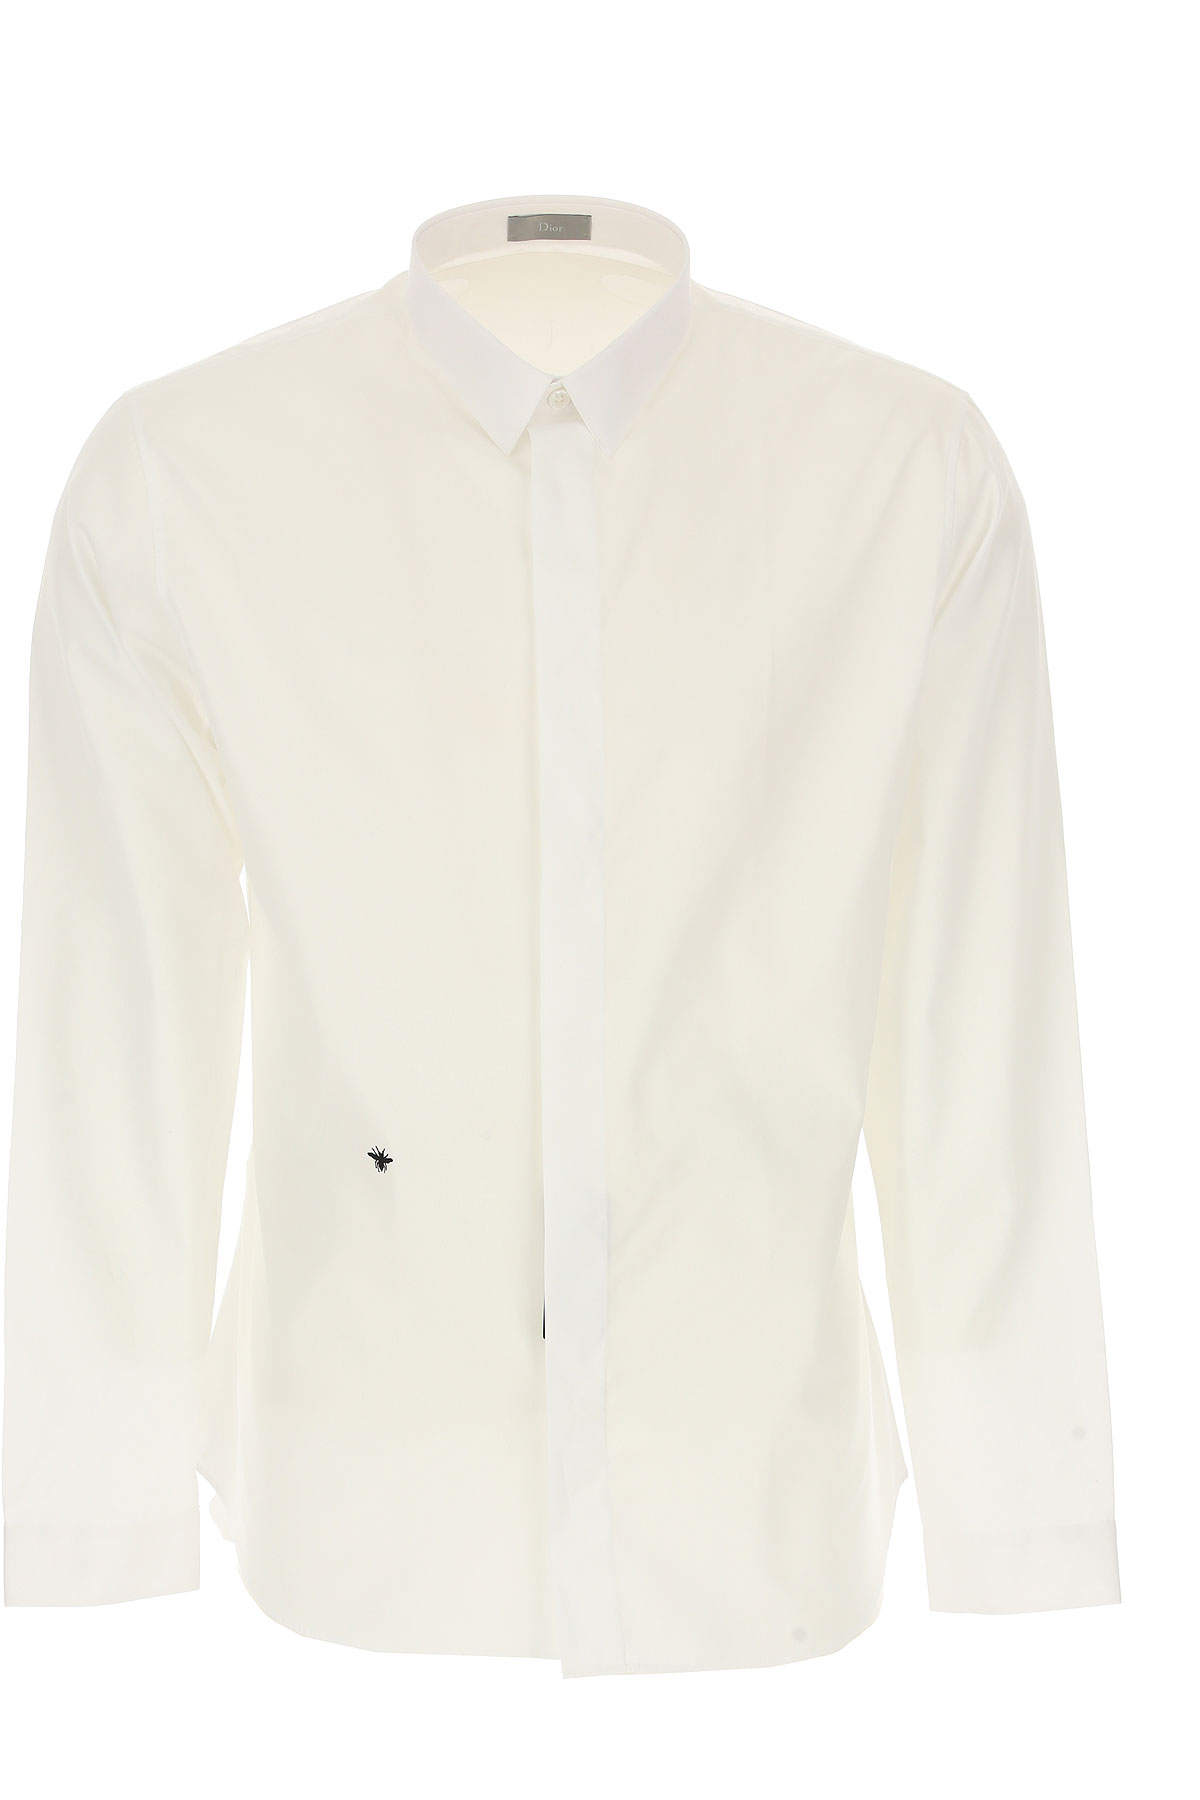 Christian Dior Chemise Homme, Blanc, Coton, 2017, 39 41